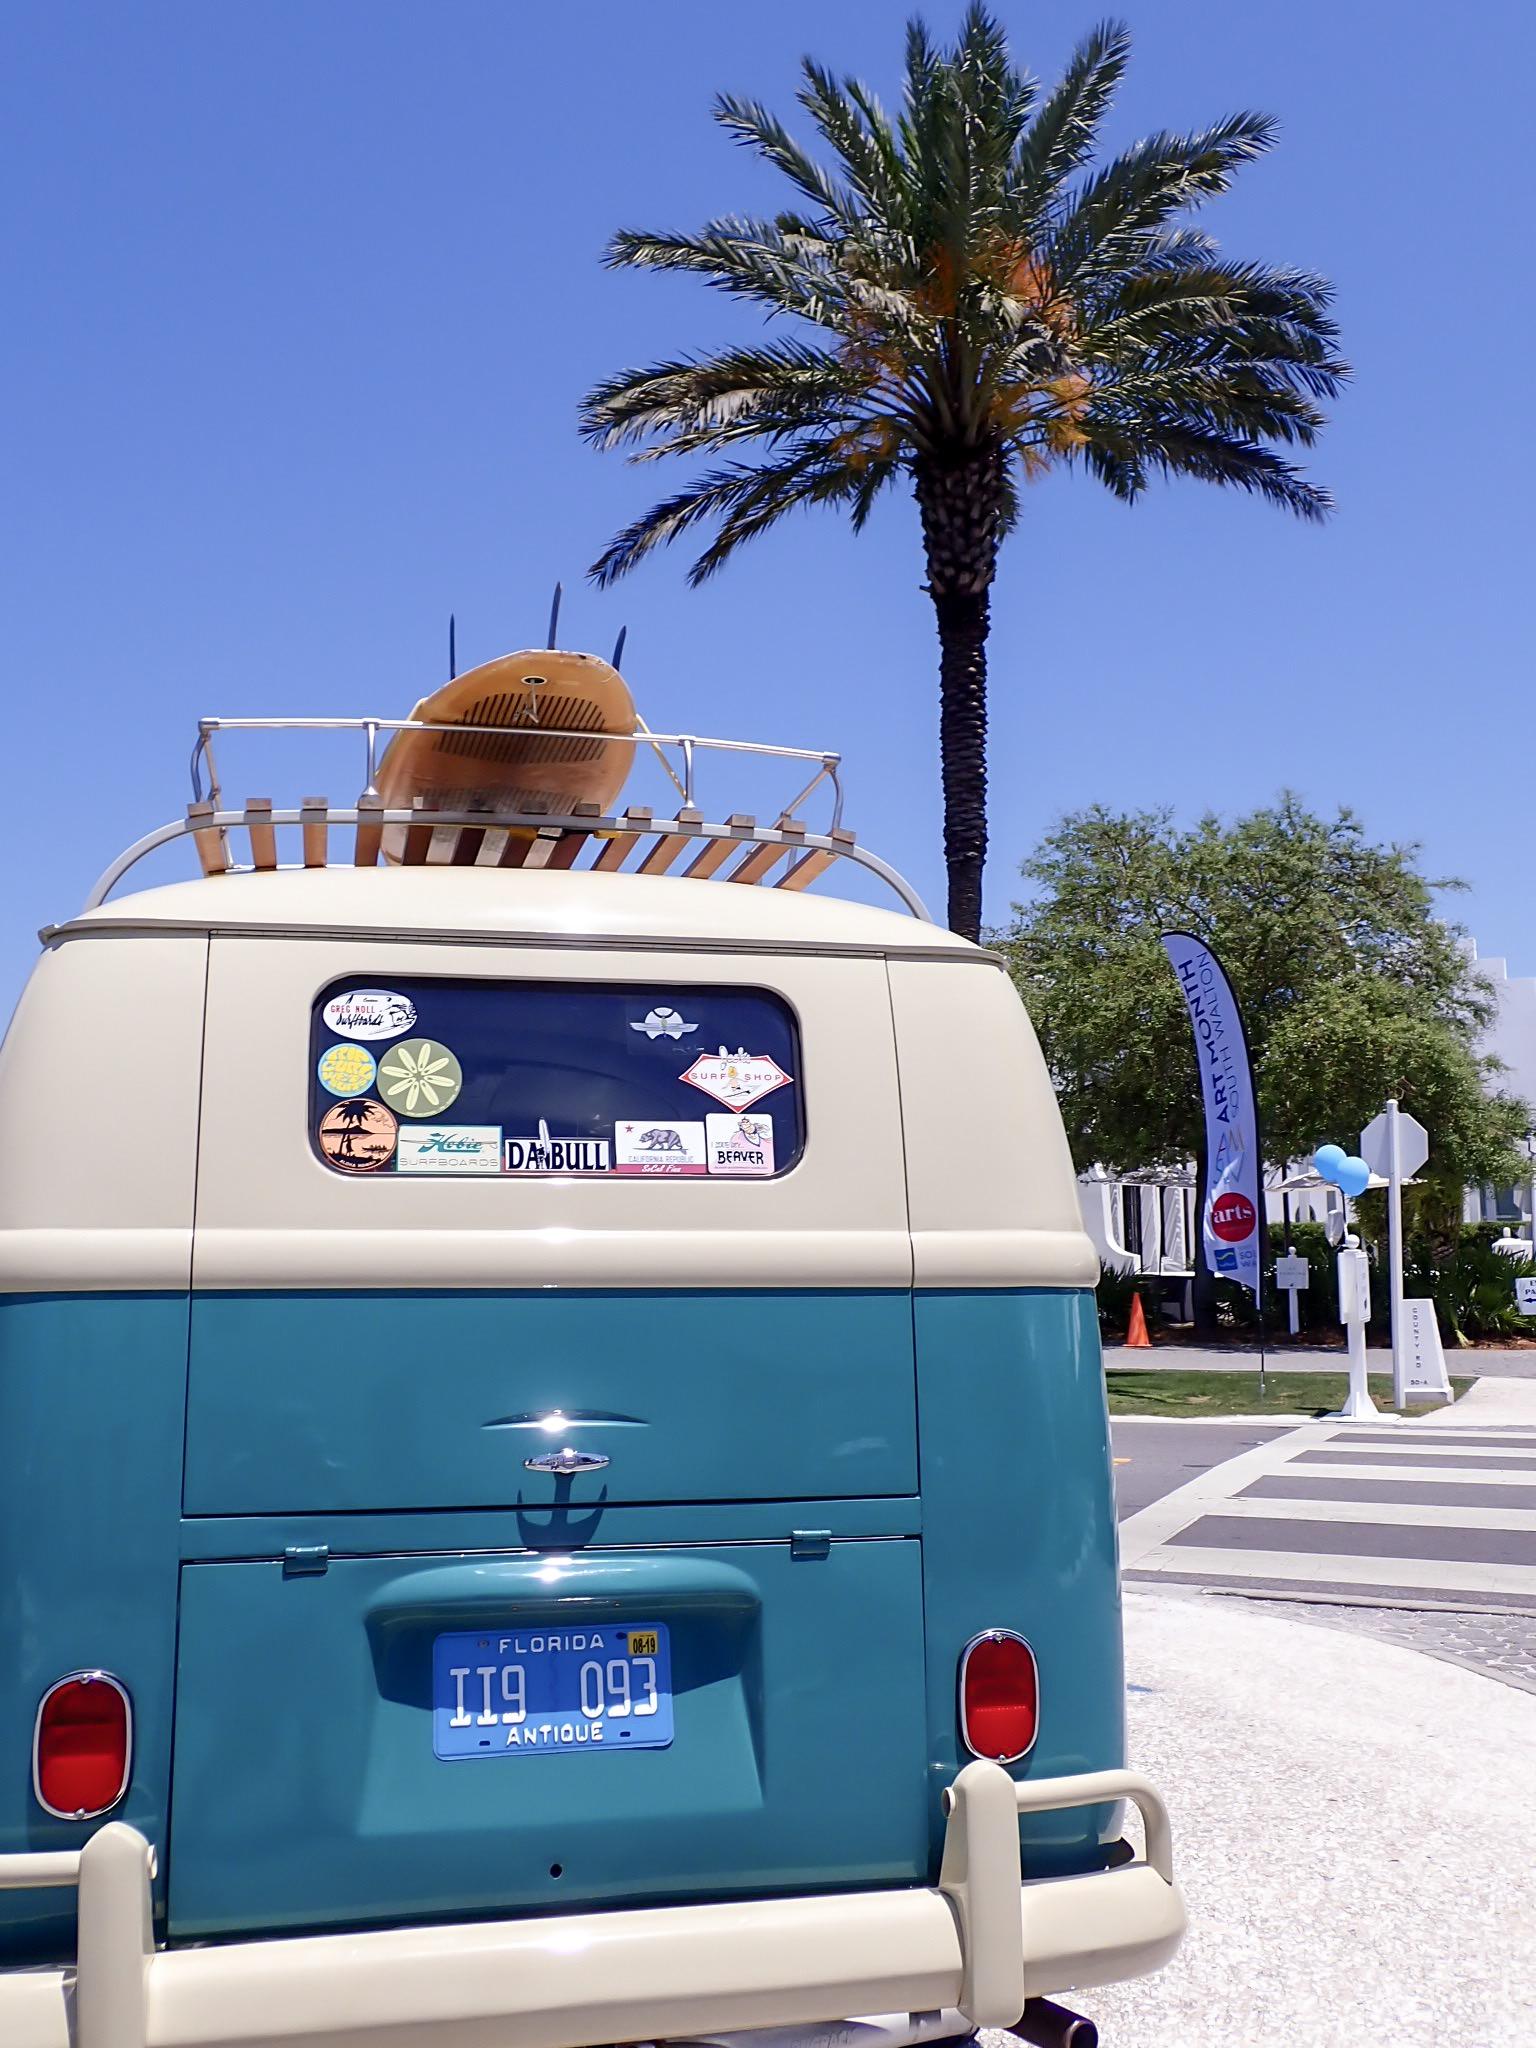 Visiting 30A Florida? Visit Aly's Beach